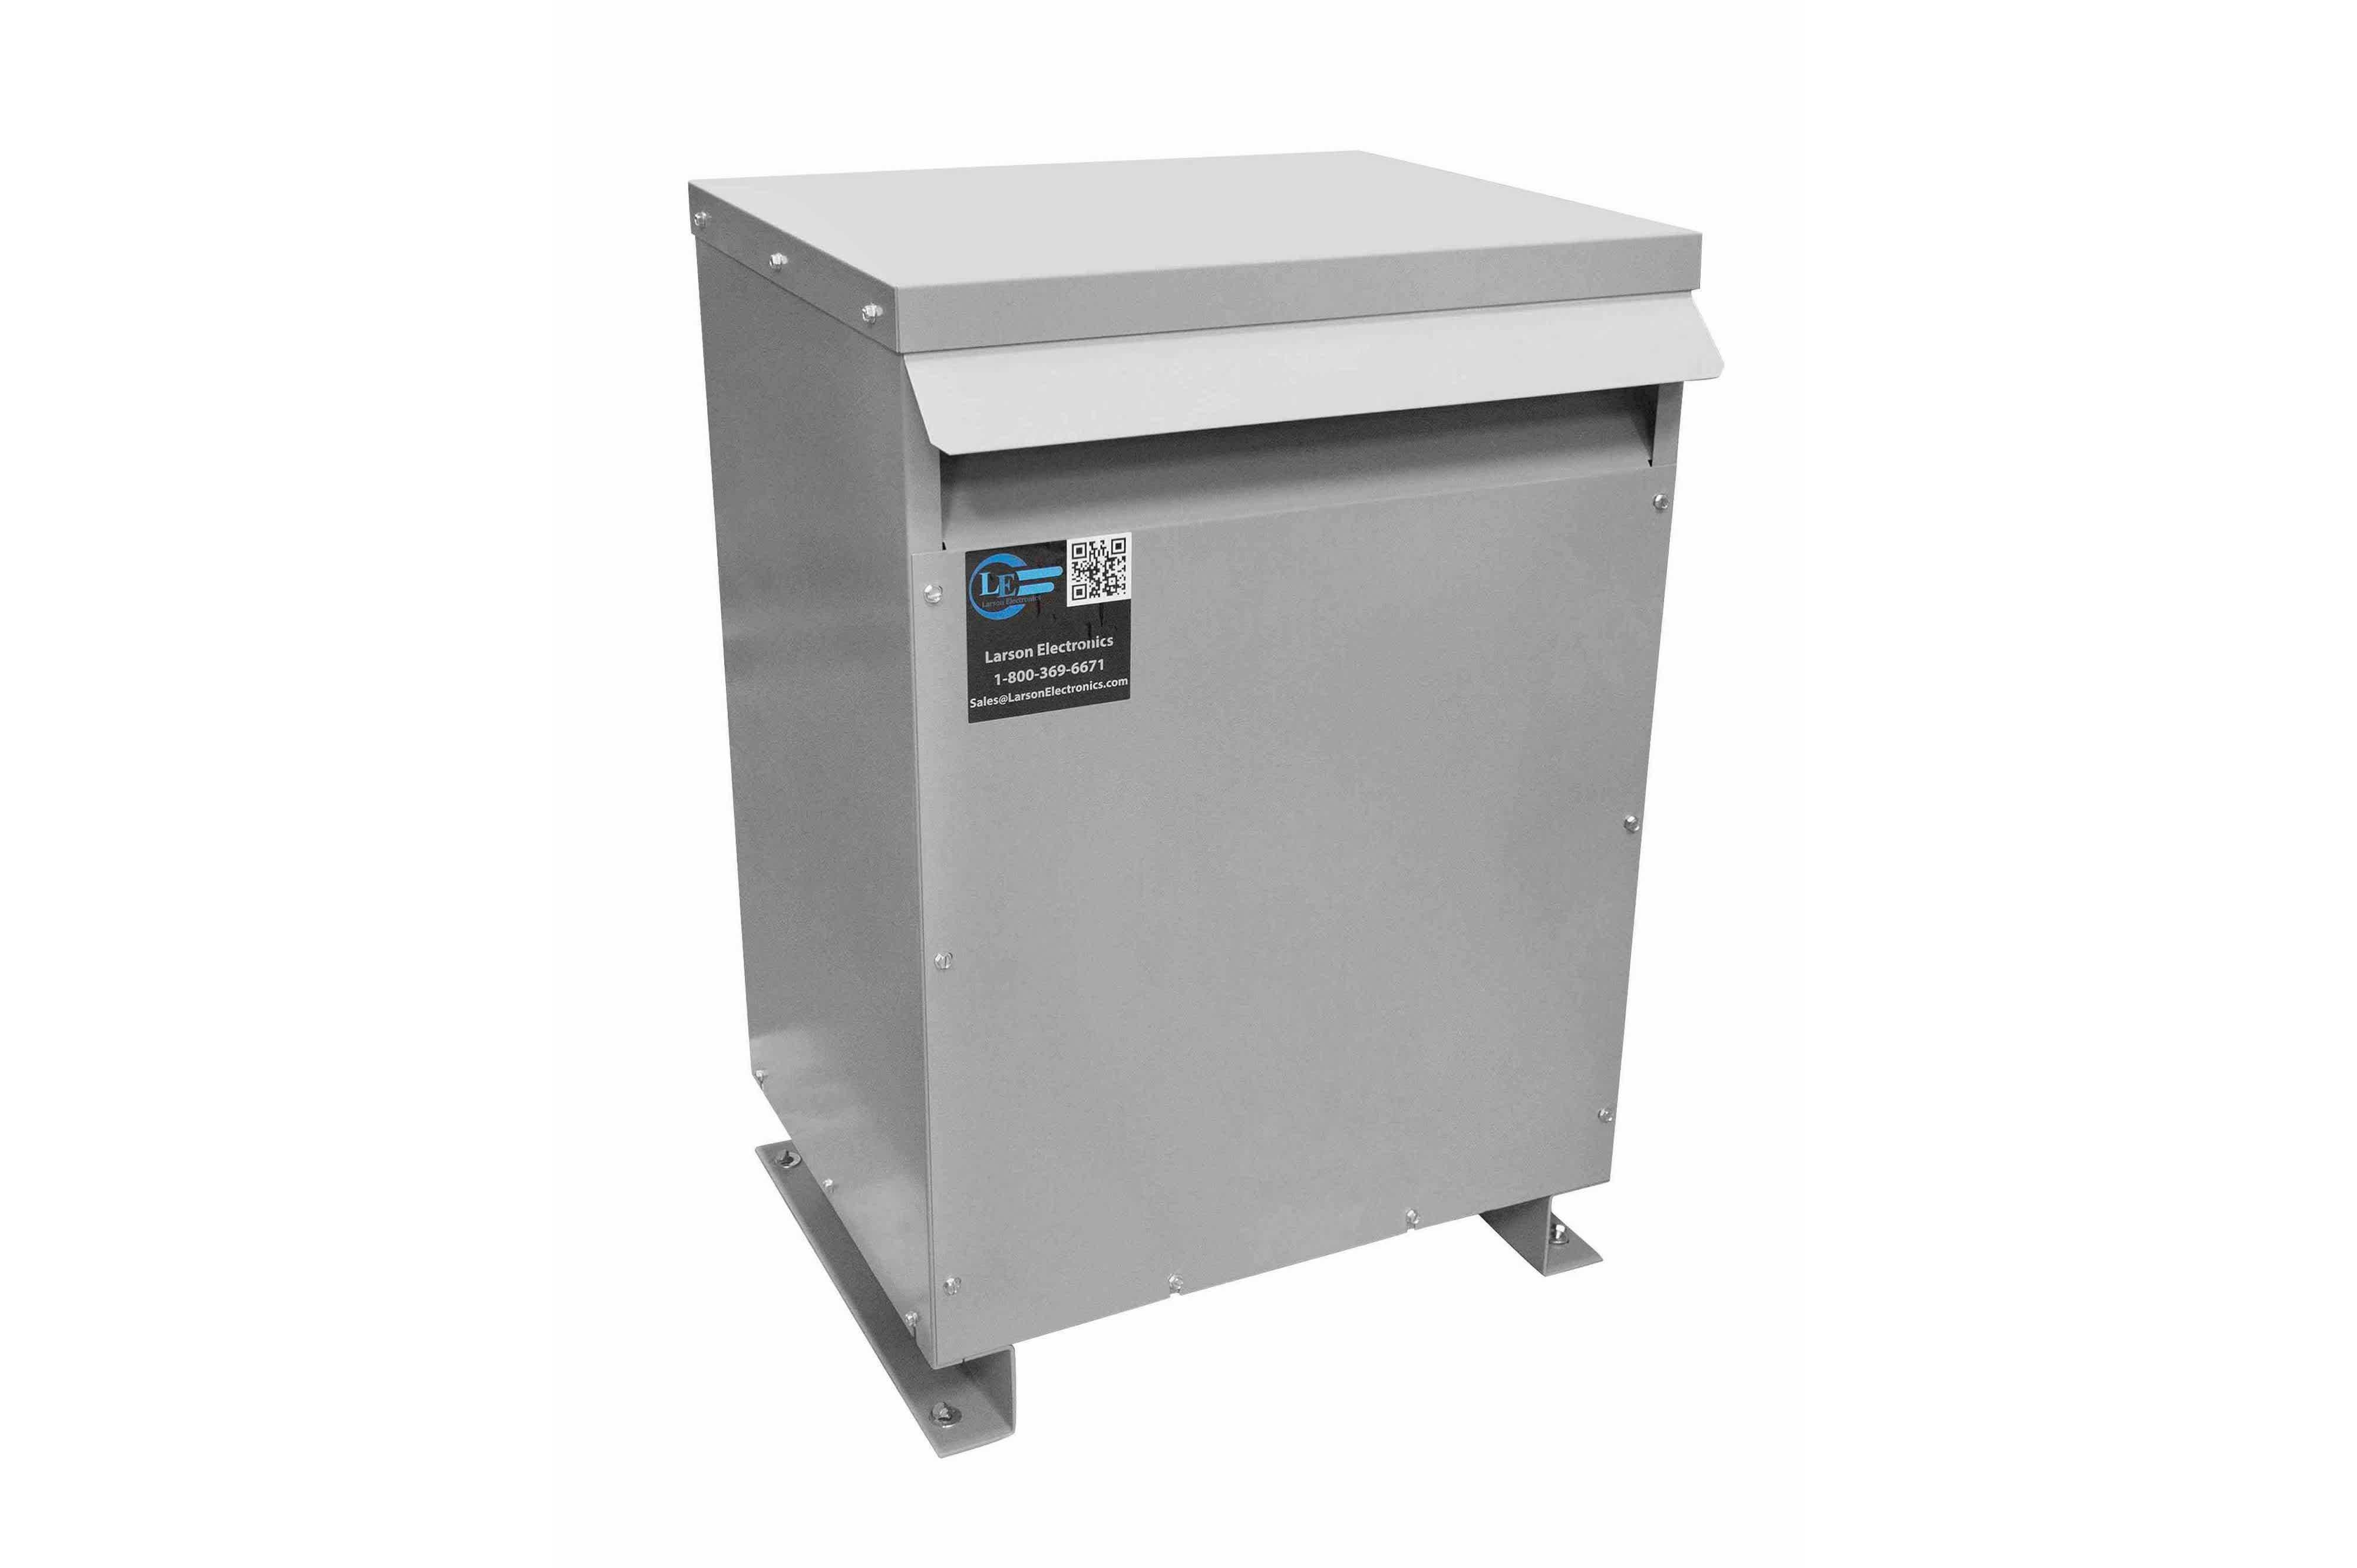 200 kVA 3PH DOE Transformer, 600V Delta Primary, 400Y/231 Wye-N Secondary, N3R, Ventilated, 60 Hz